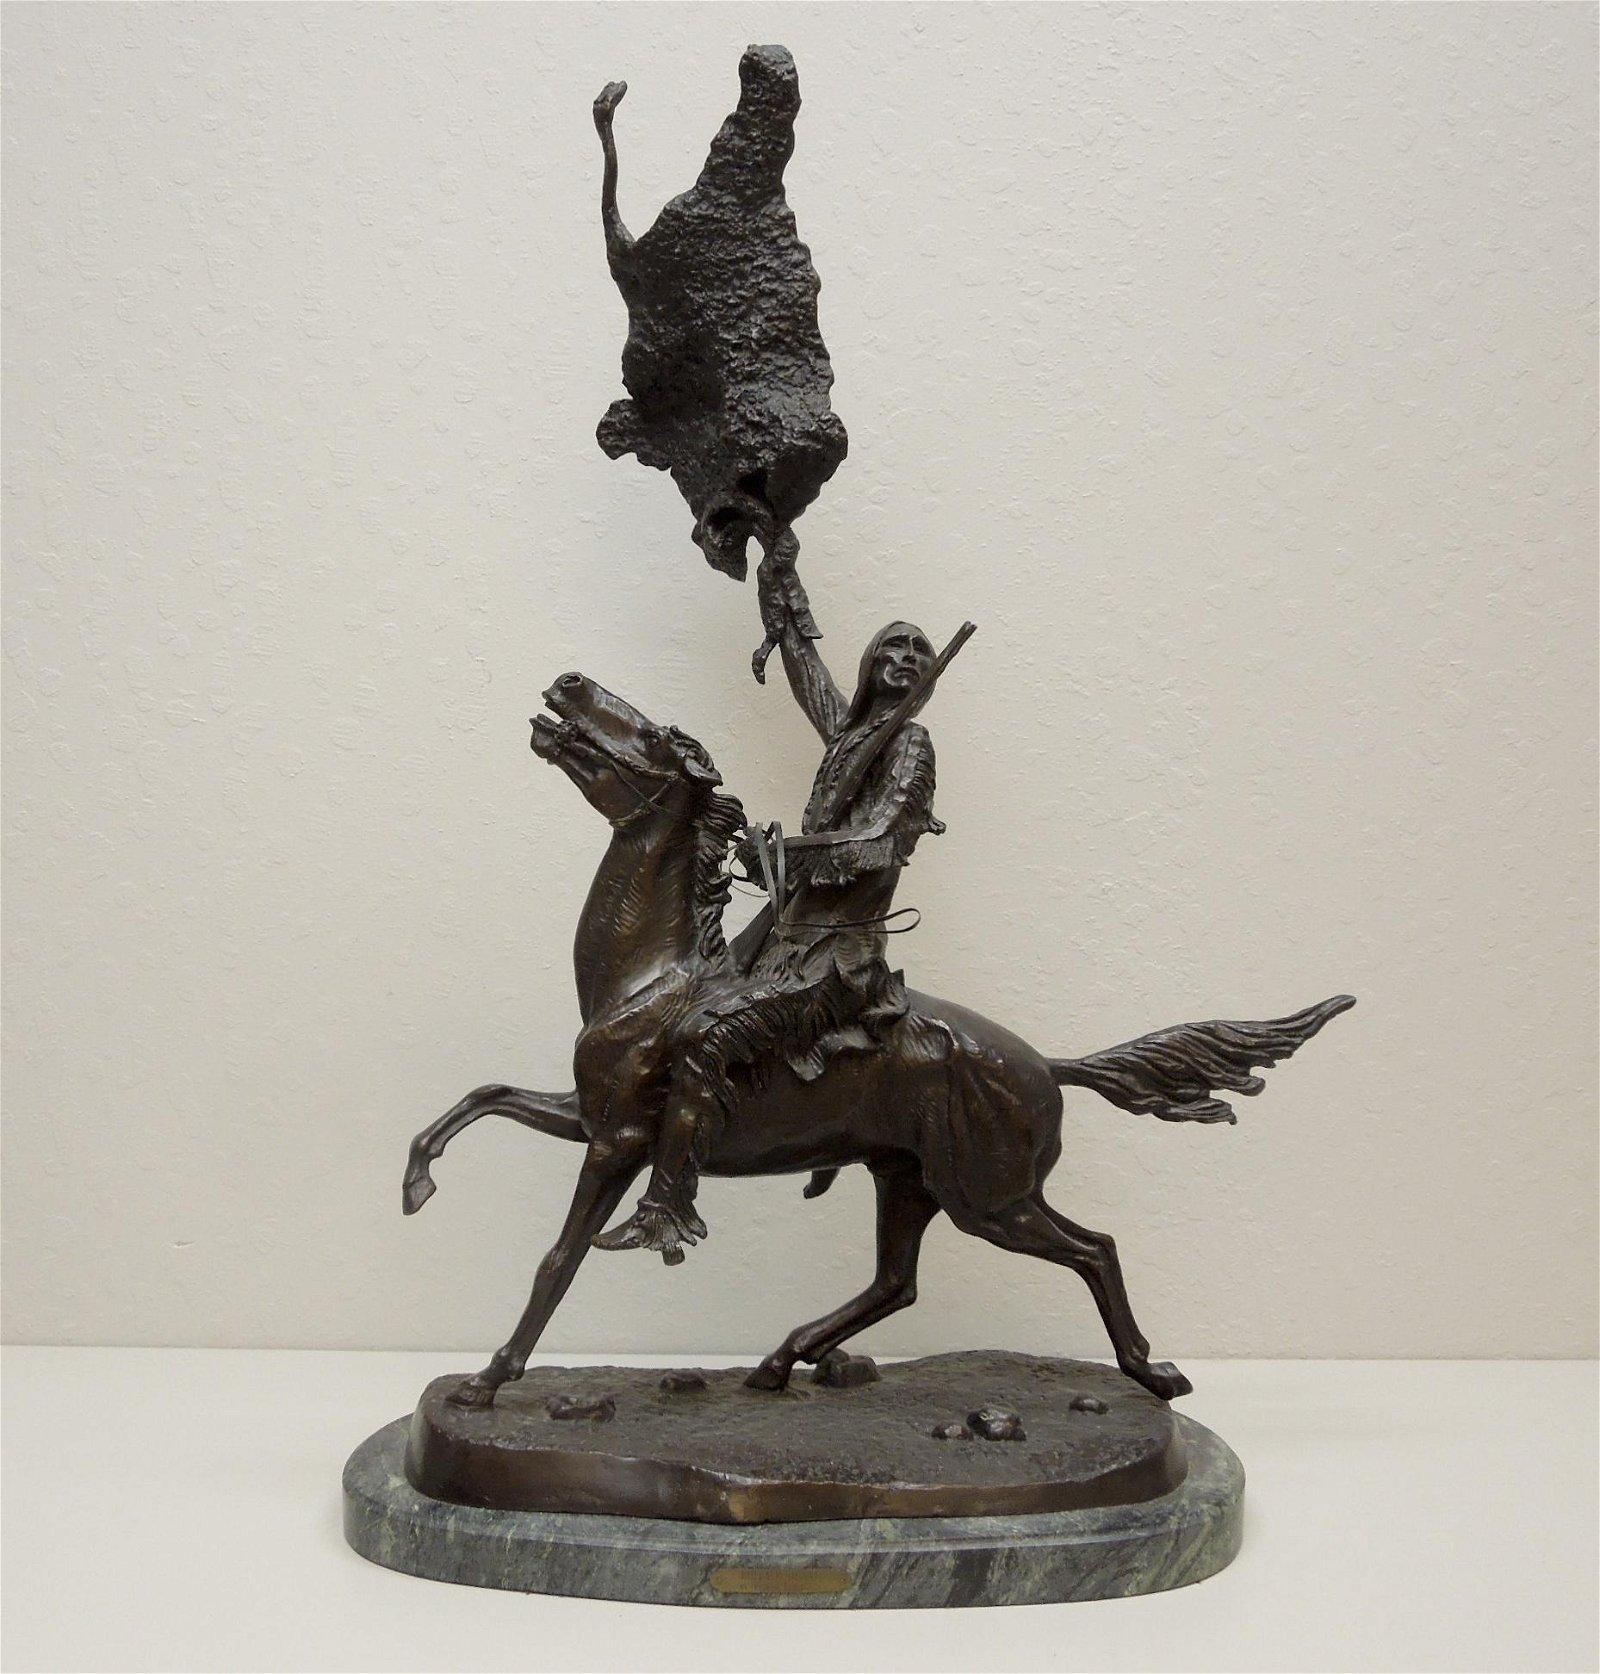 After Frederic Remington, Bronze Sculpture, Buffalo